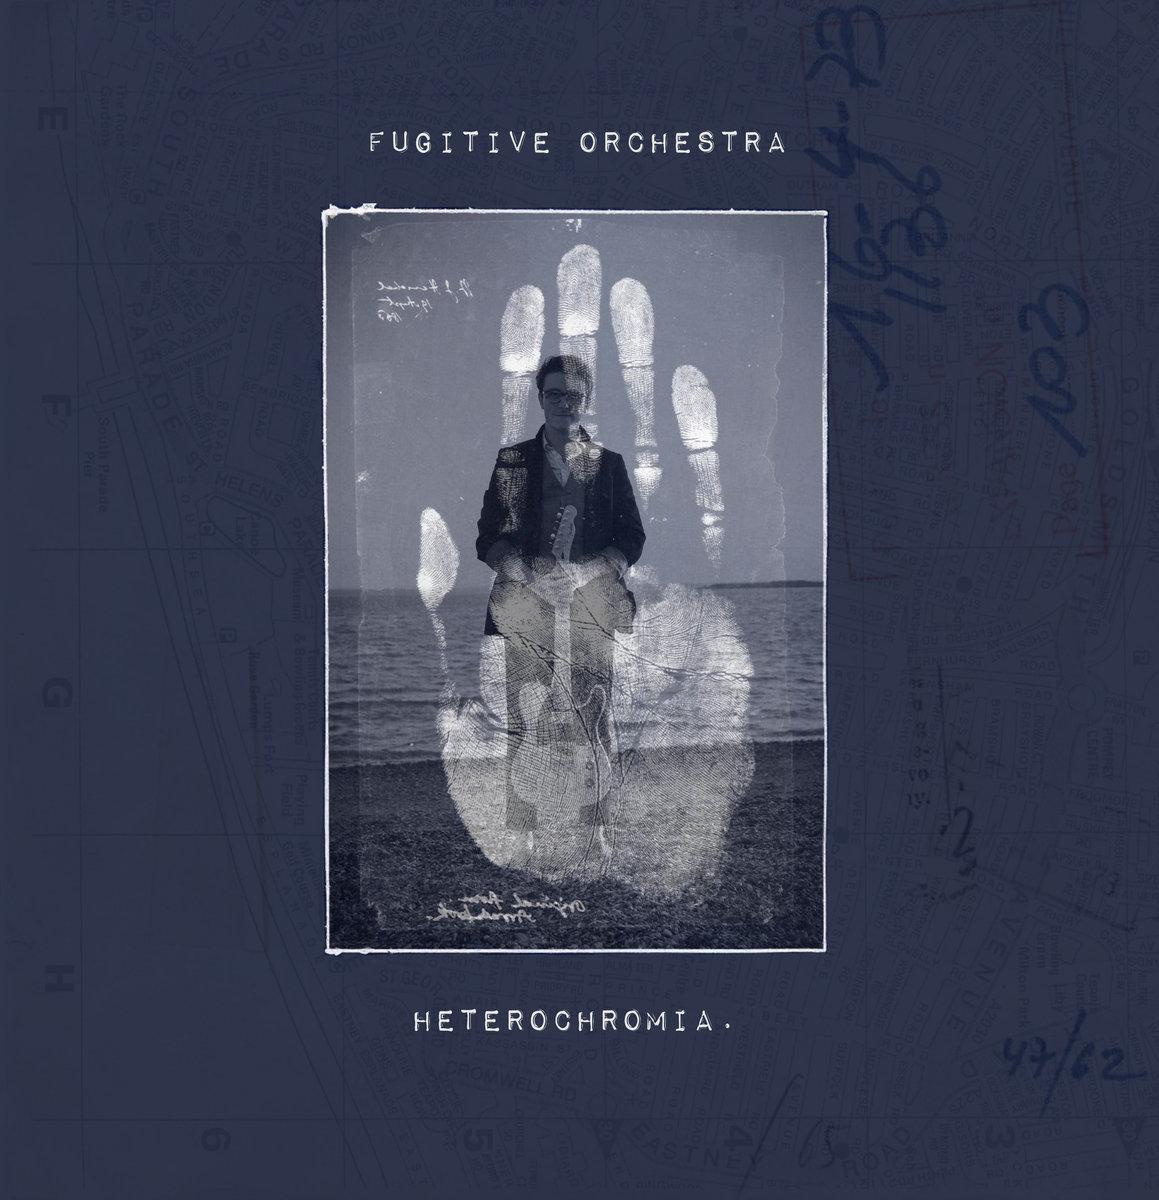 Fugitive Orchestra - Heterochromia.